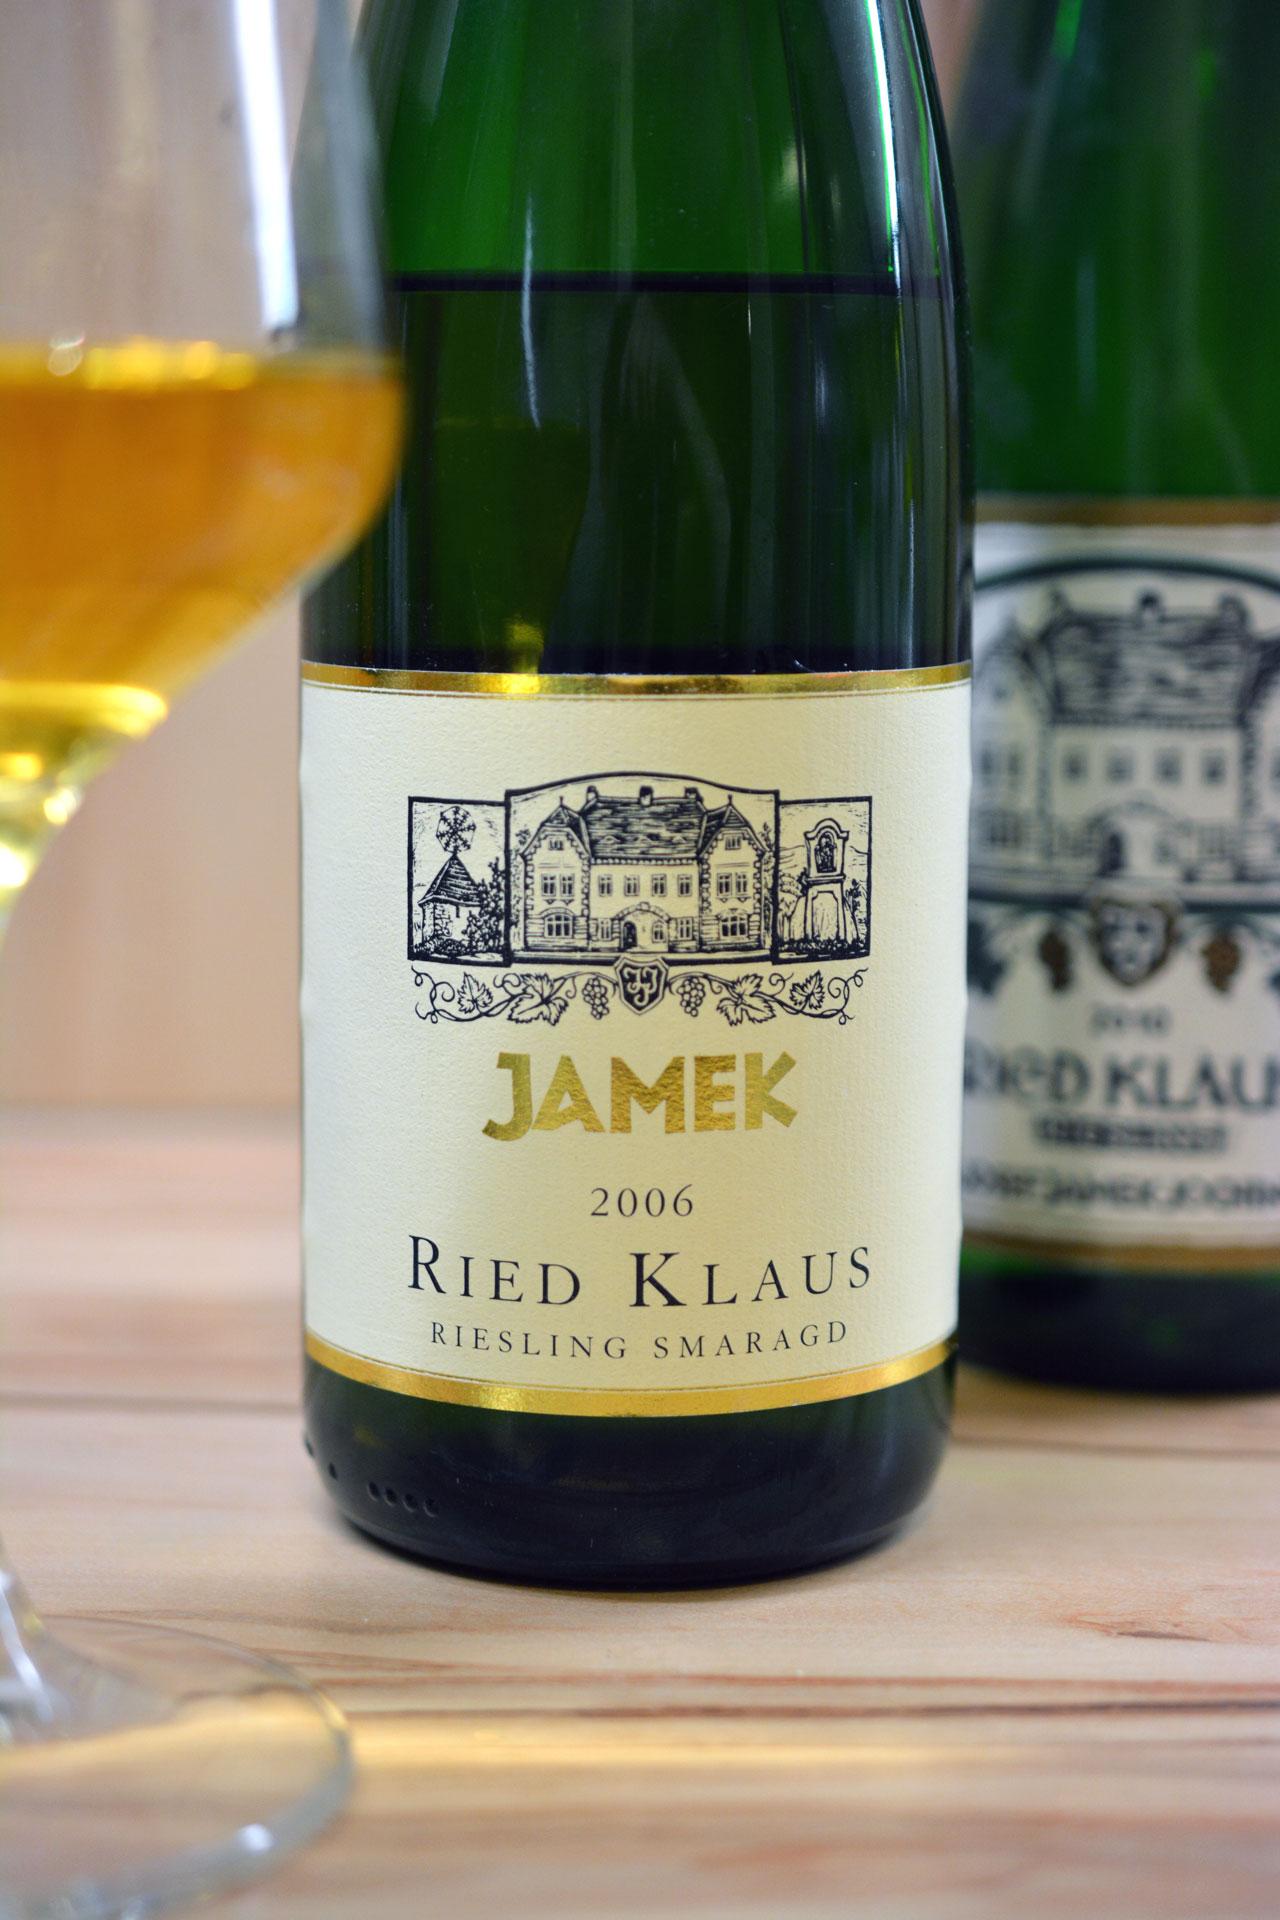 Jamek Riesling Ried Klaus Smaragd 2006